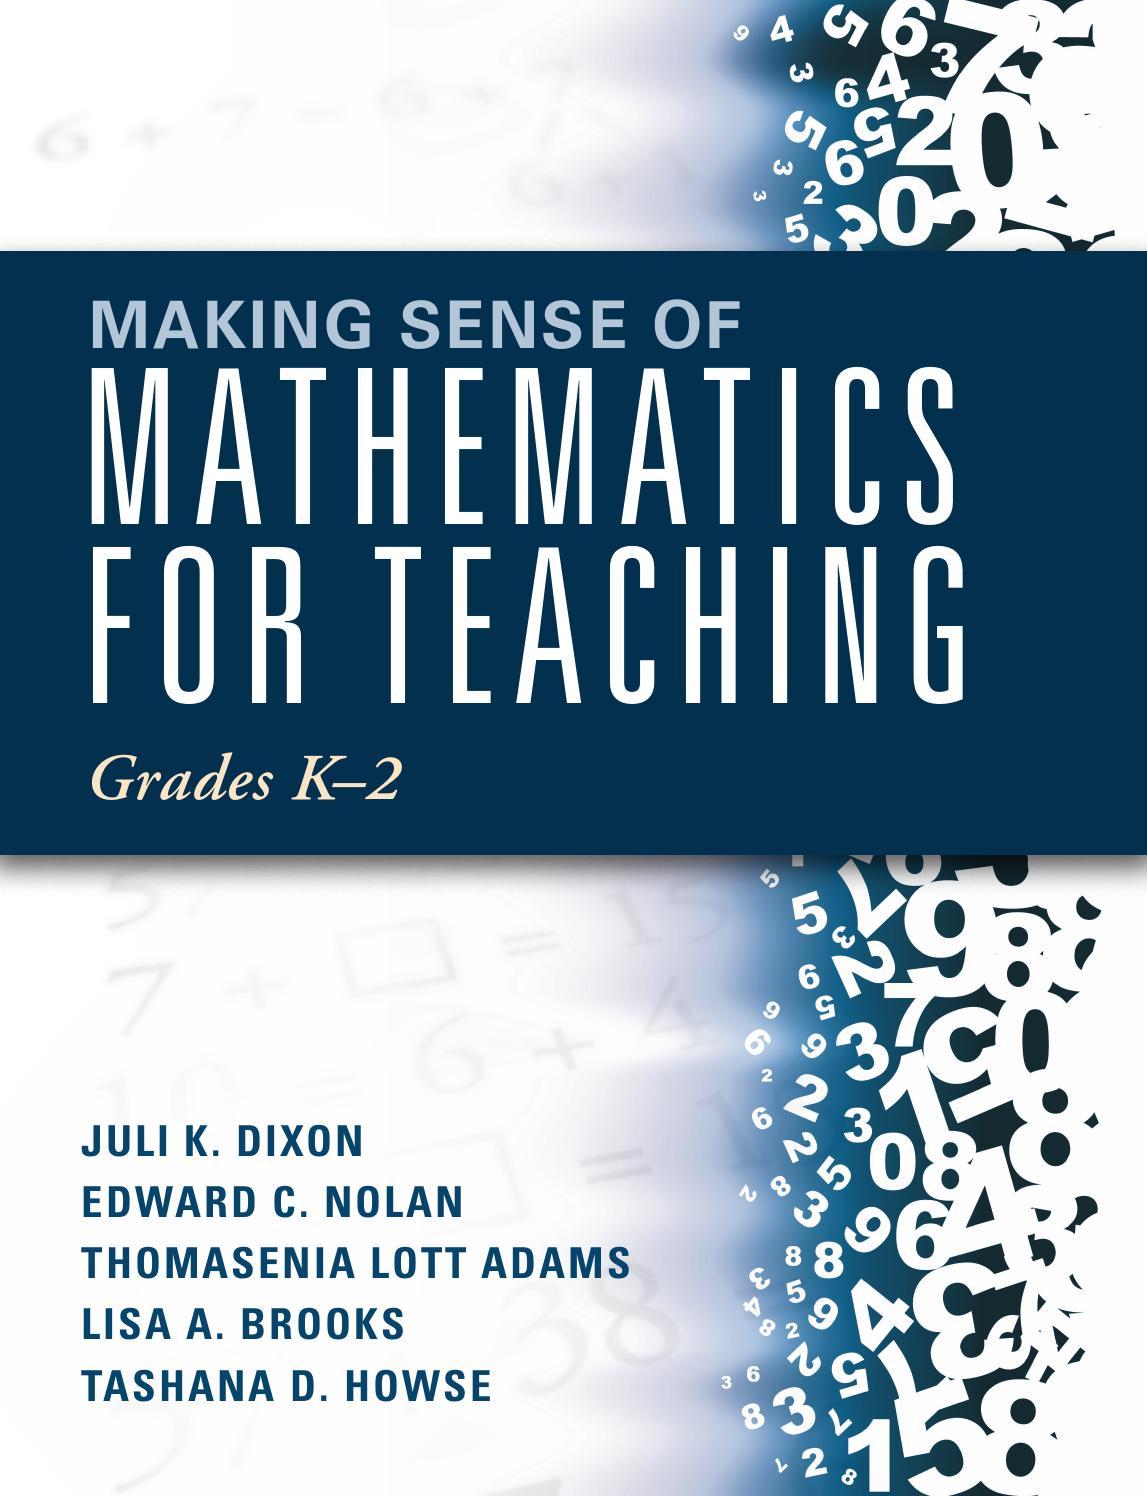 Making Sense of Mathematics for Teaching Grades: K-2